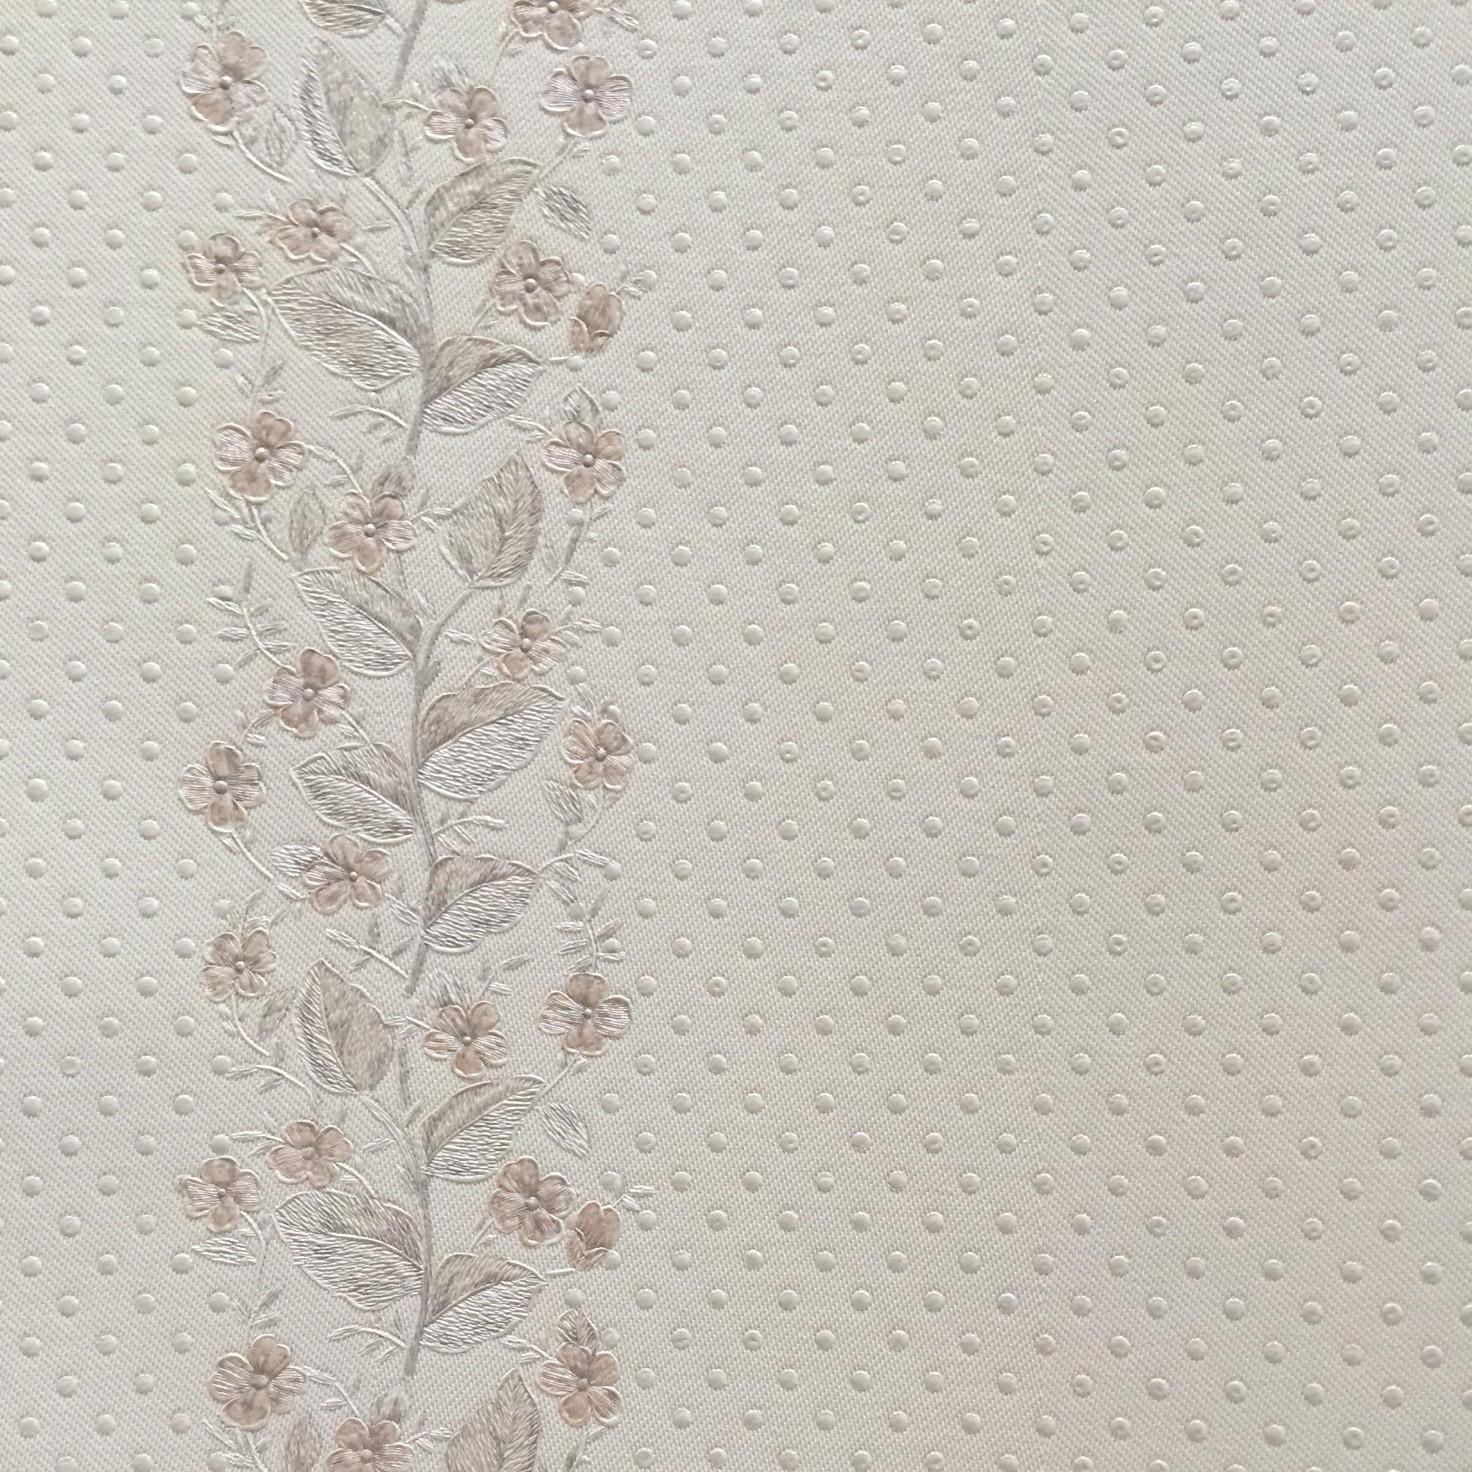 Papel de Parede Vinilico Texturizado Floral Branco AW079 - Jolie